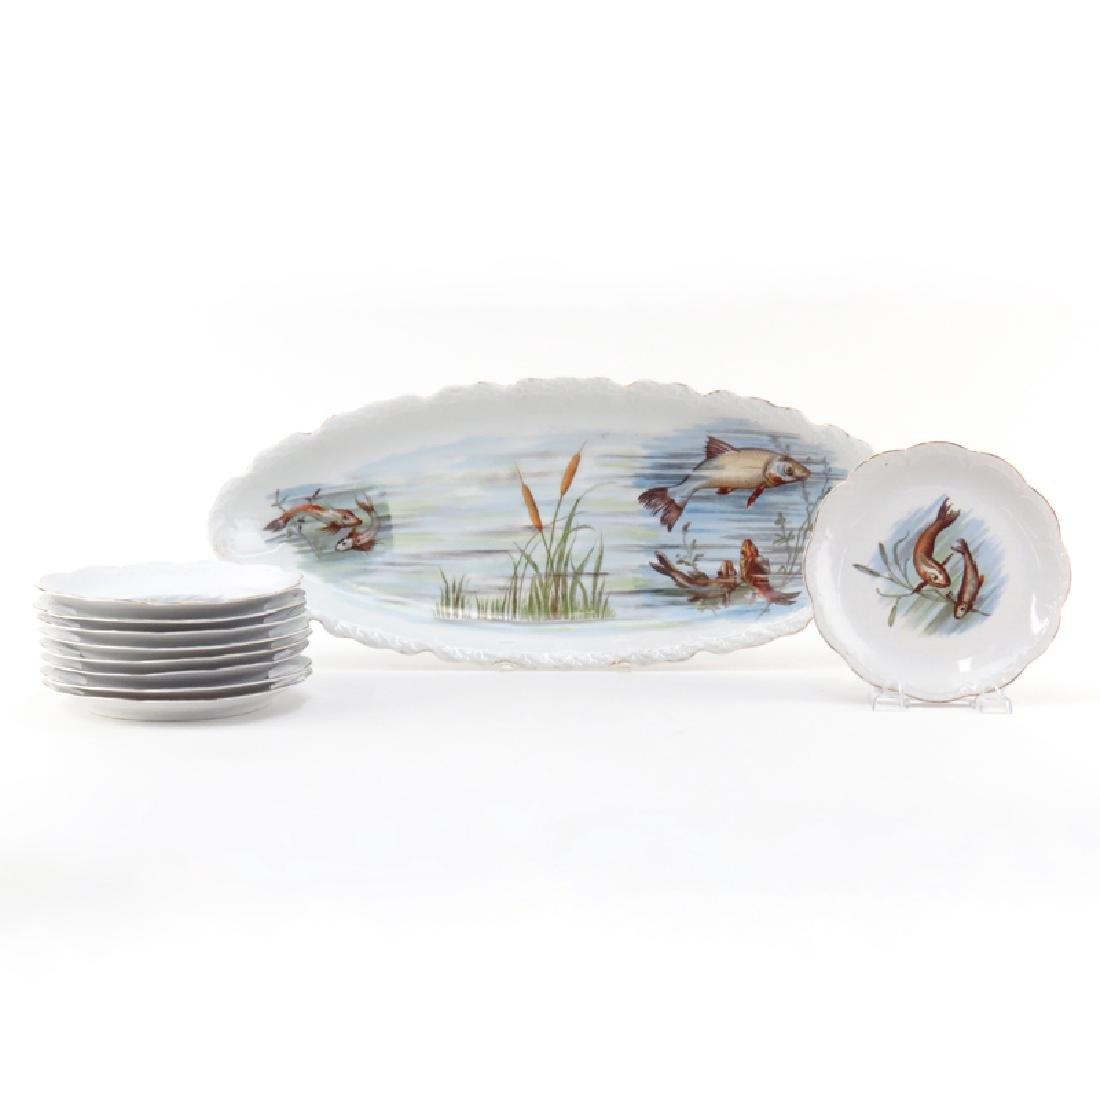 Vintage Ten (10) Piece Transferware Porcelain Fish